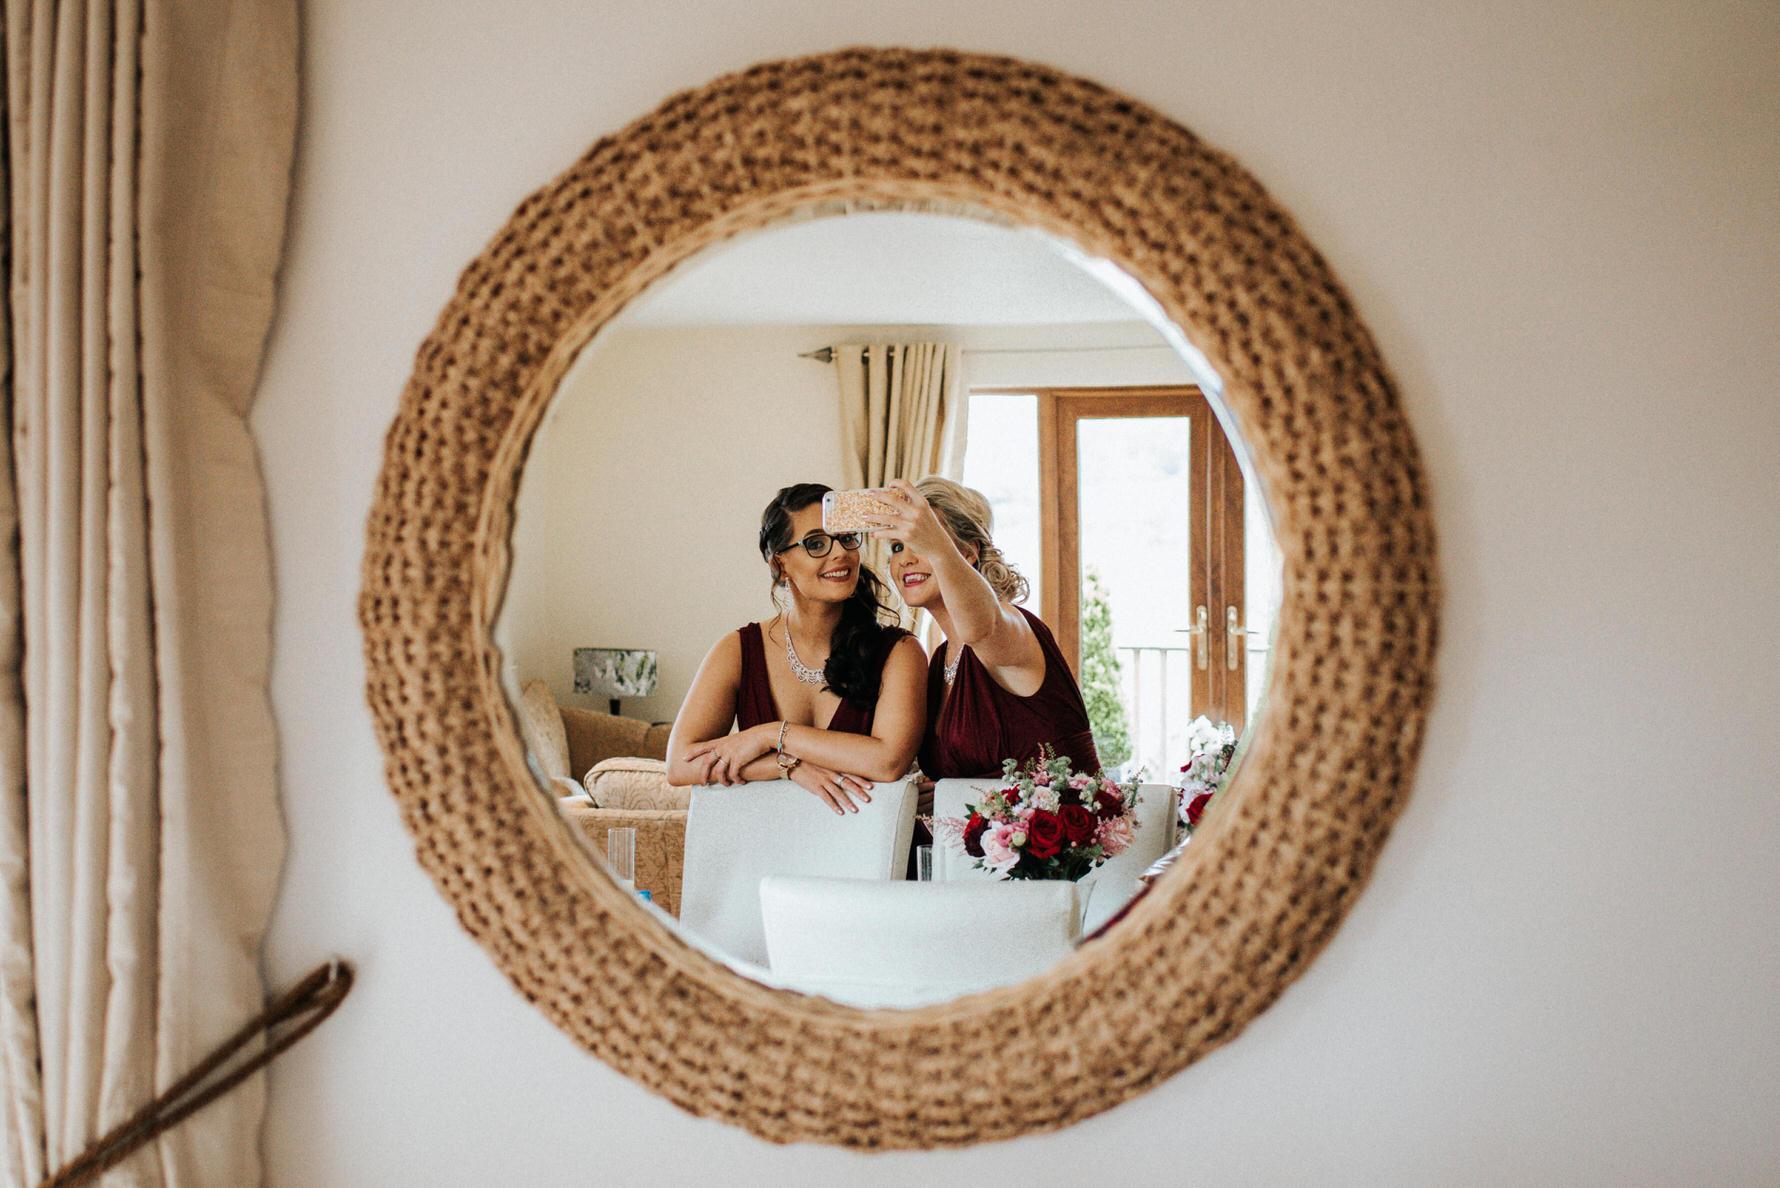 Cheshire Wedding Photojournalism - bridesmaids selfie reflection in the mirror